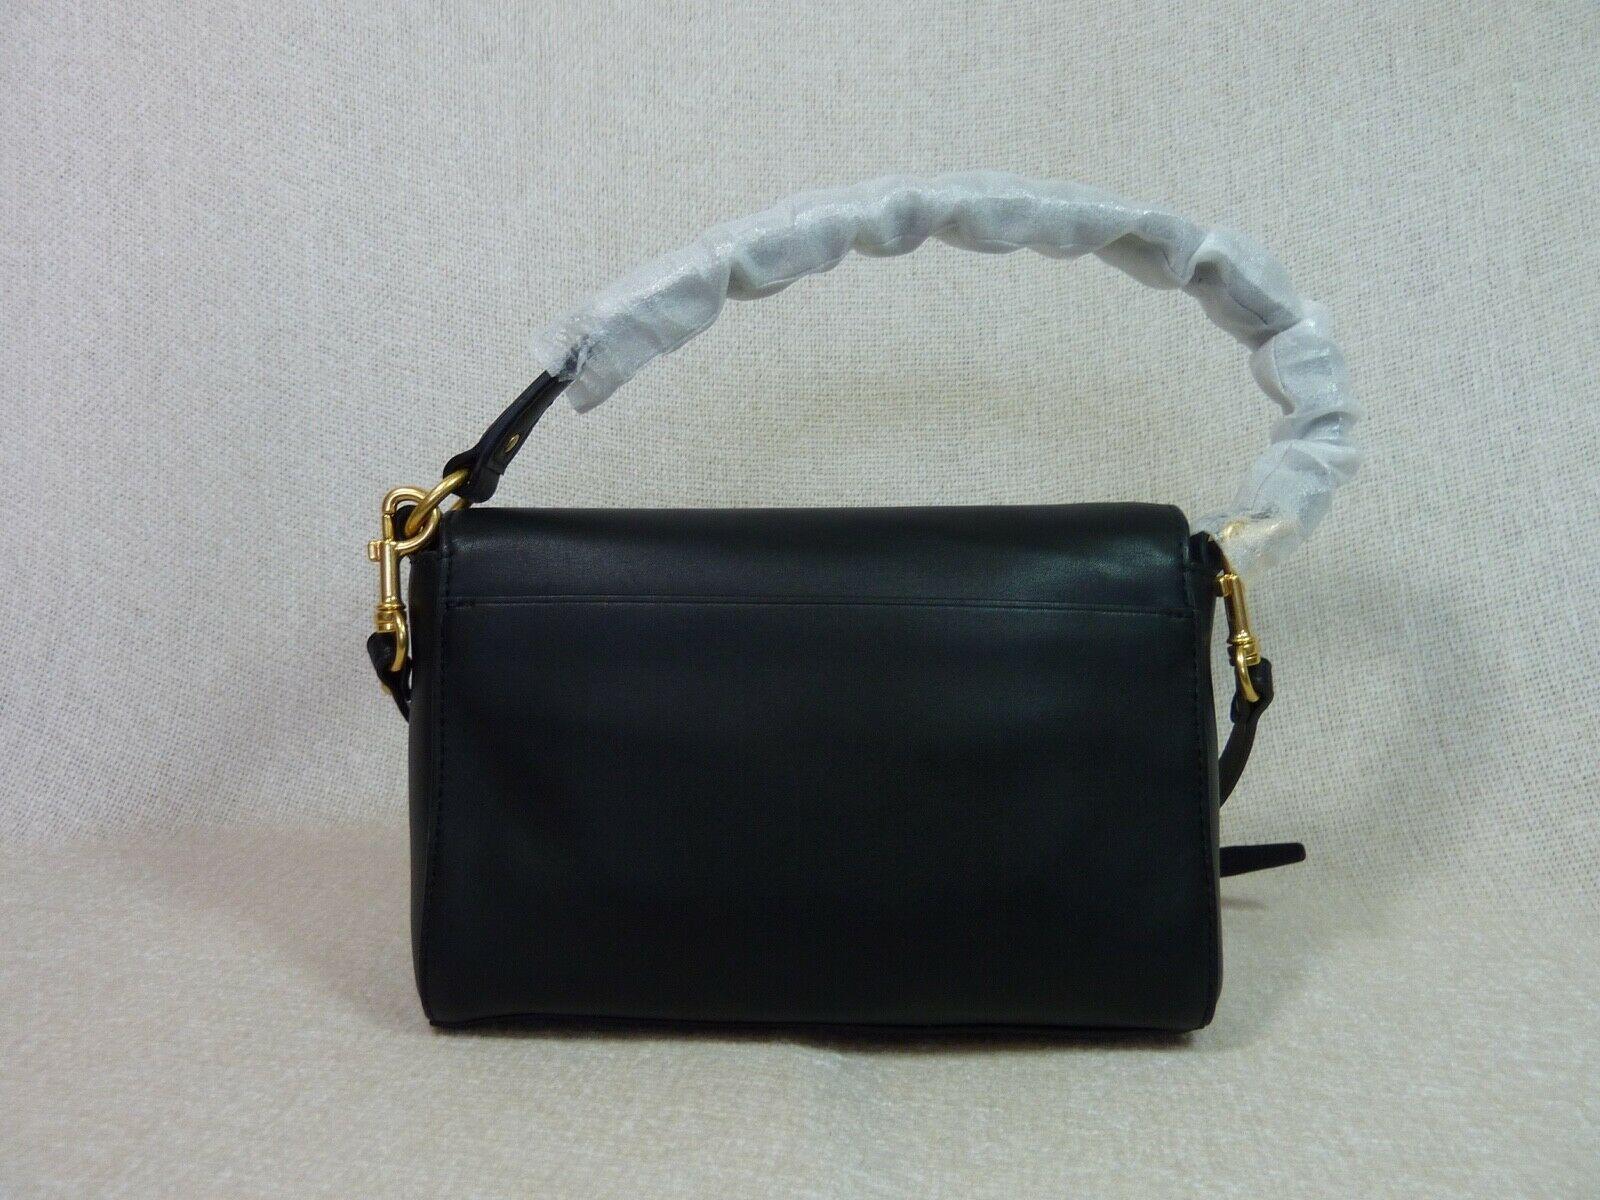 NWT Tory Burch Black Leather Miller Metal Cross-Body Bag/Mini Shoulder Bag $398 image 5